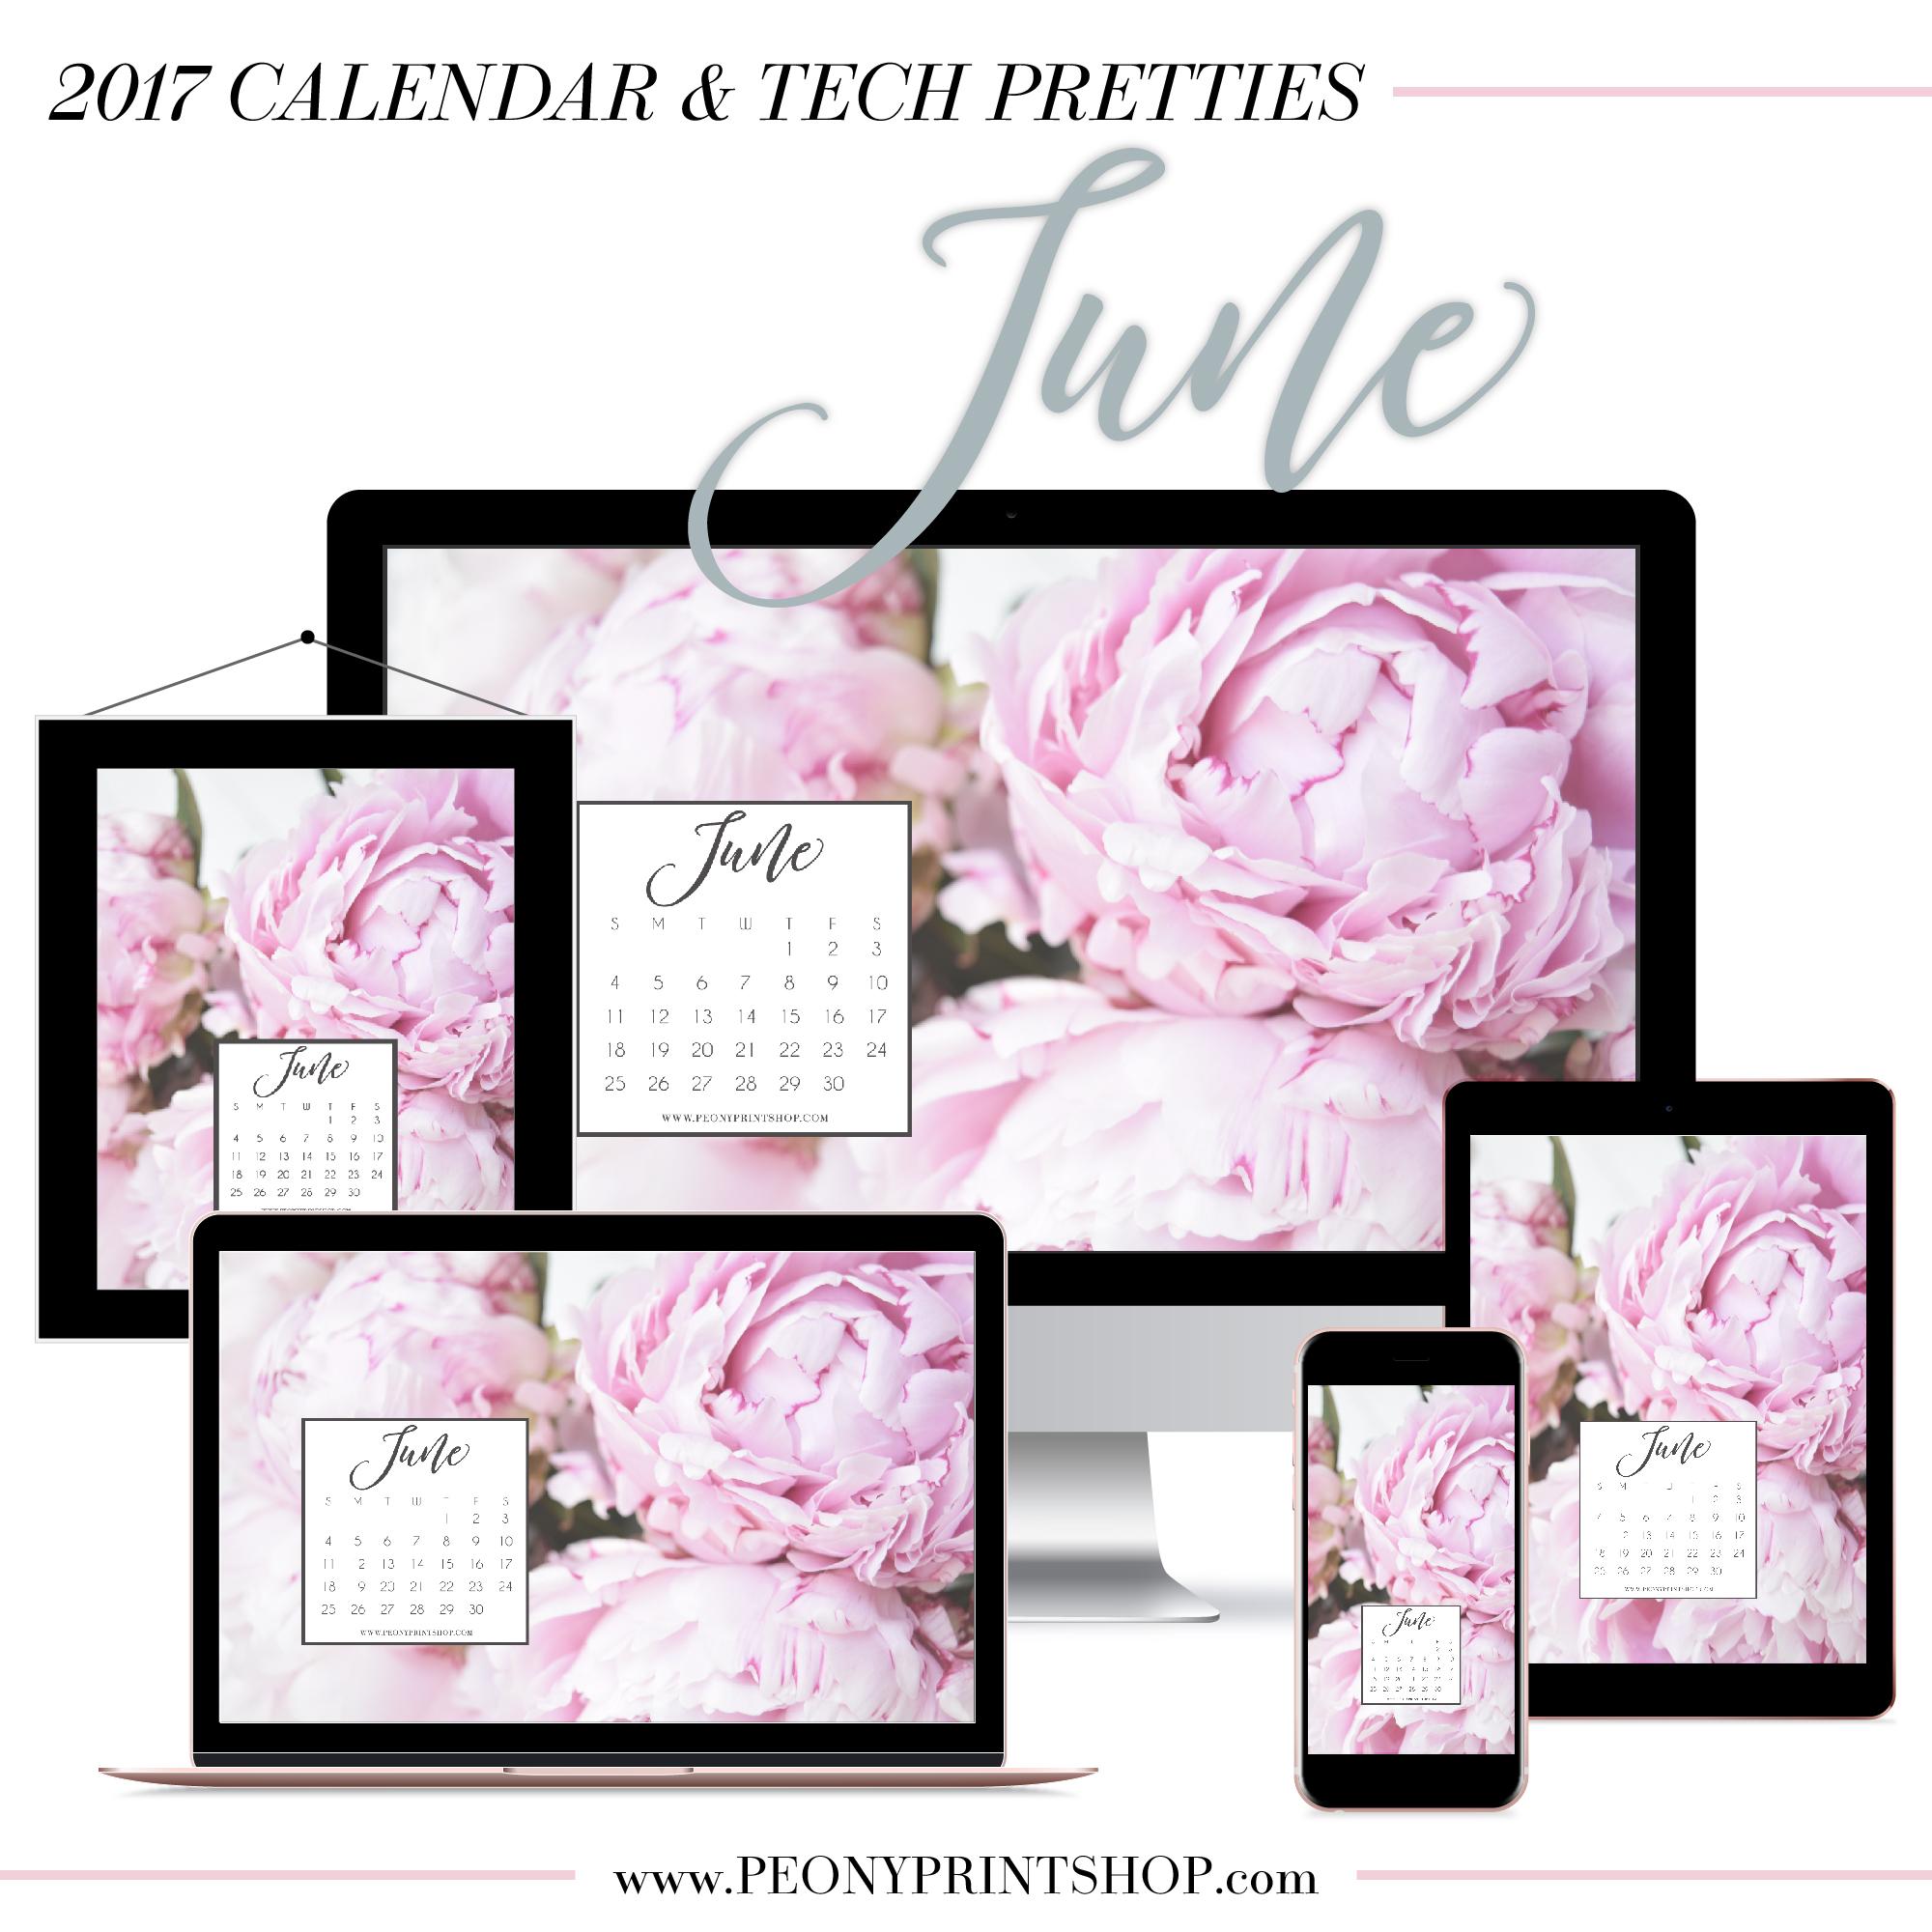 2017 June Calendar + Tech Pretties  |  PeonyPrintshop.com